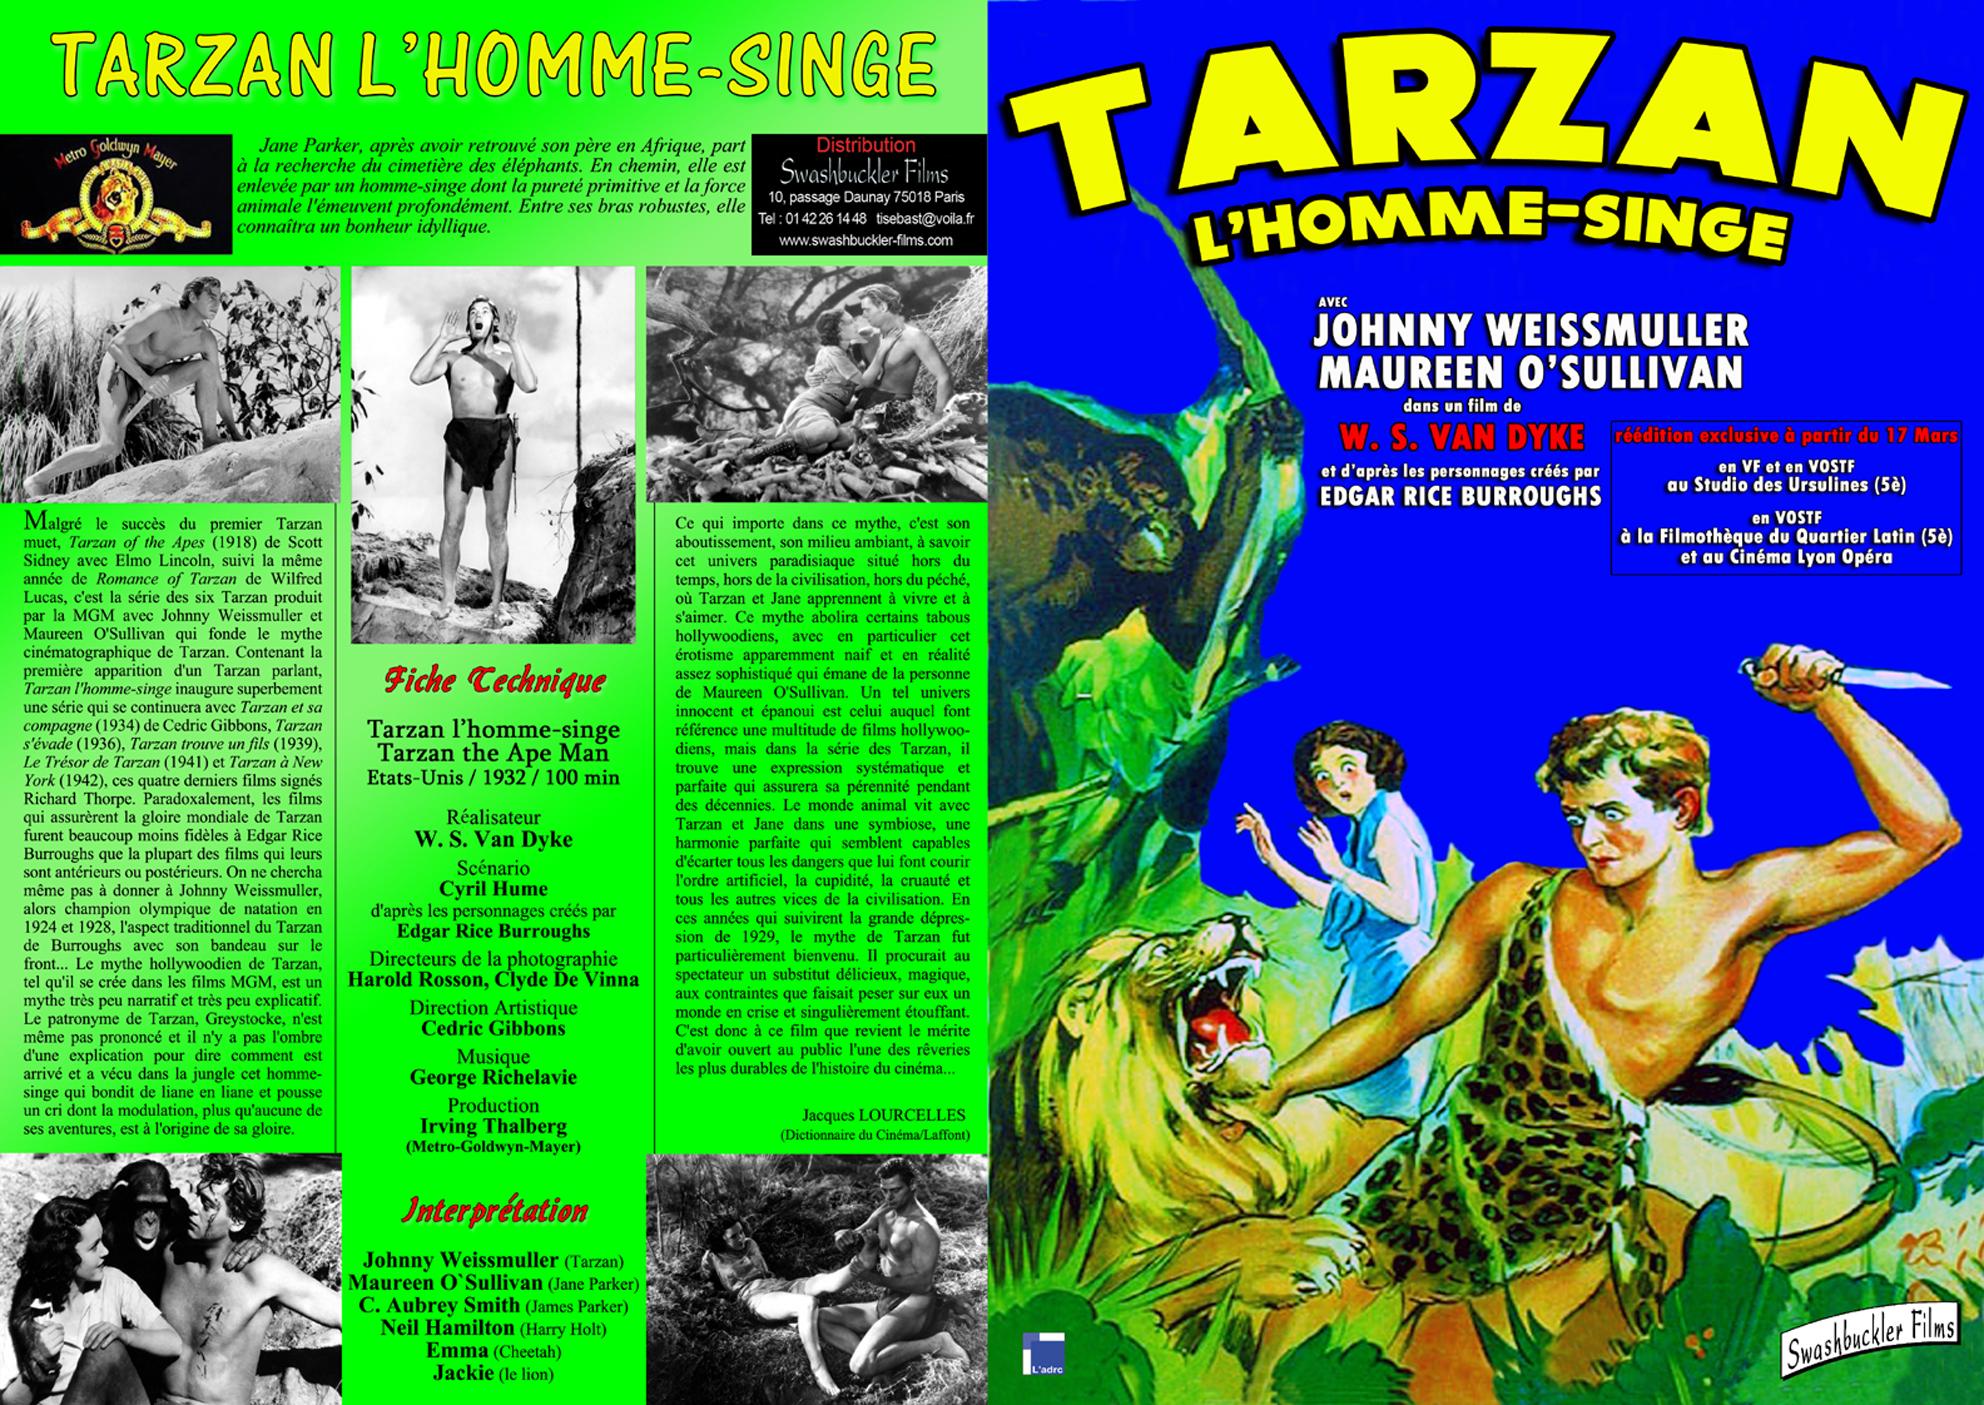 tarzan lhomme singe 1932